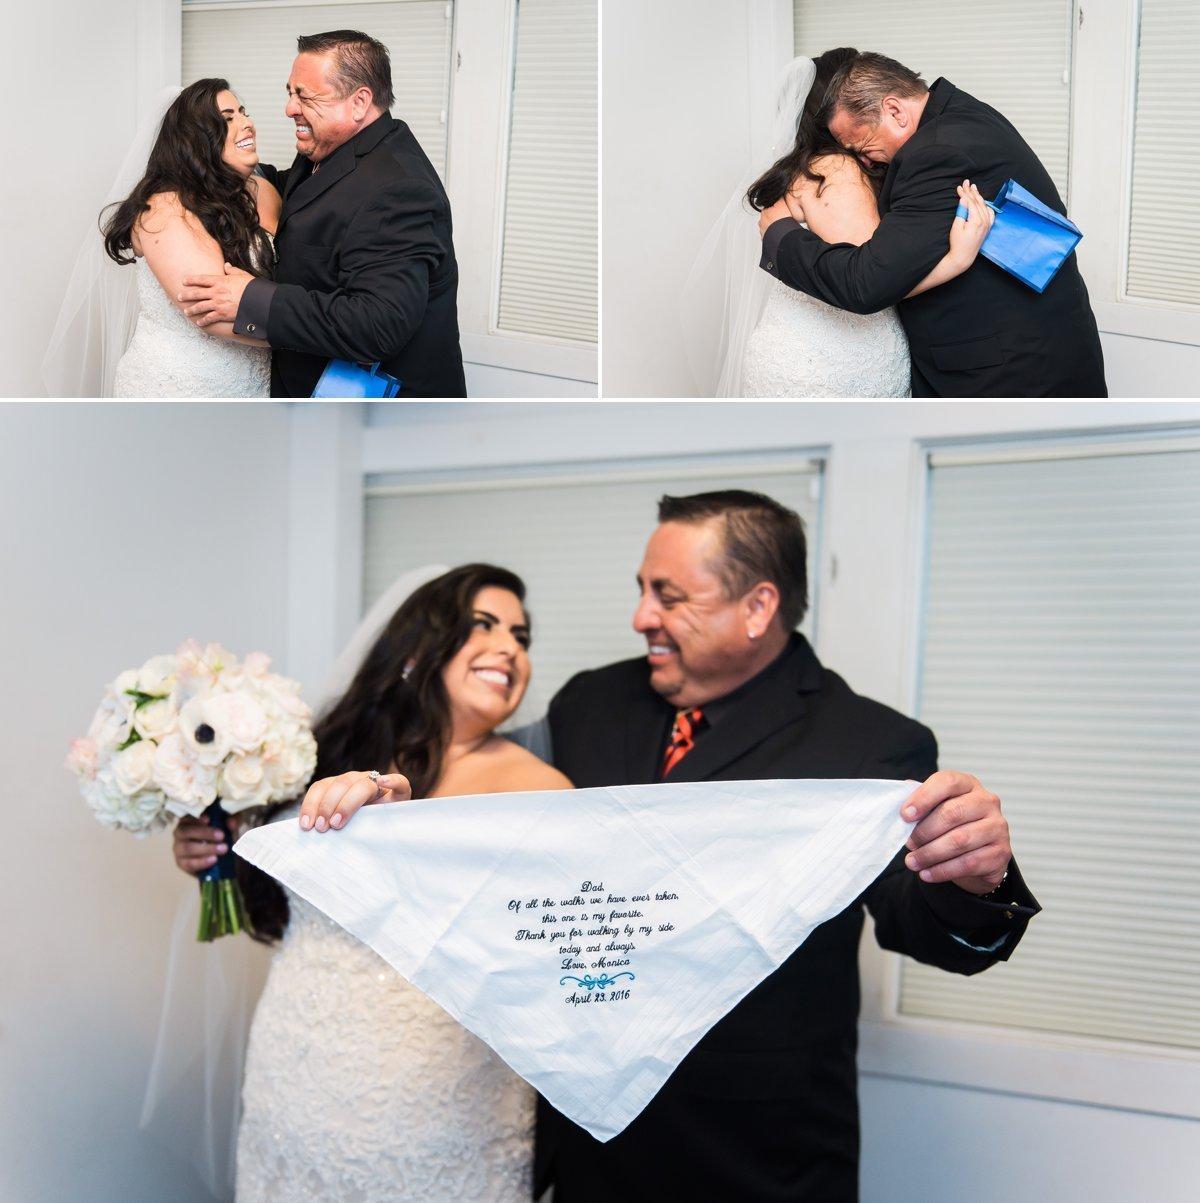 Monica-JJ Wedding 16